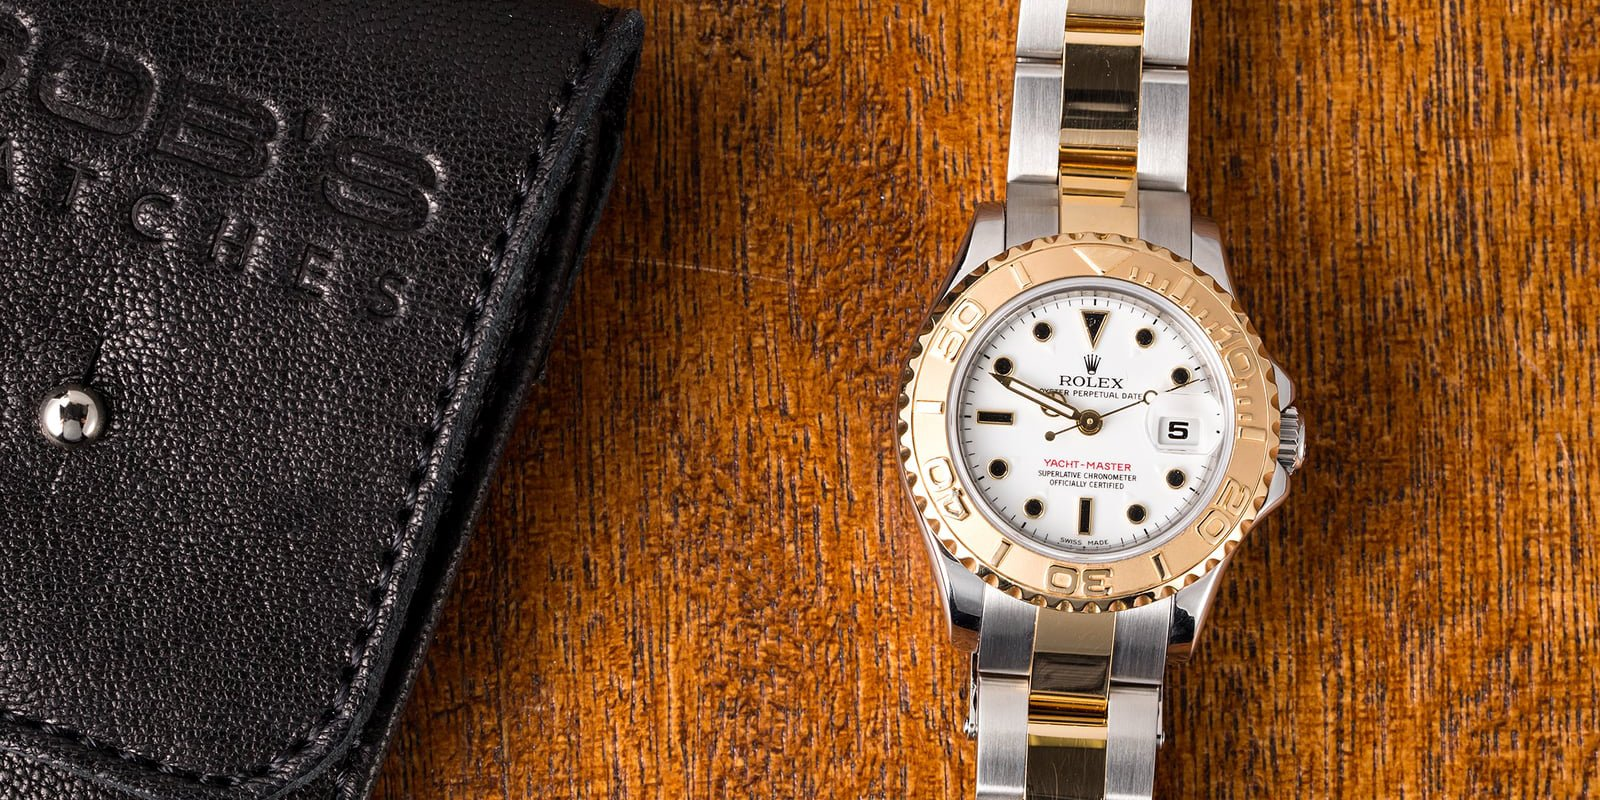 Rolex Watches for Women that Won't Break the Bank Yacht-Master 169623